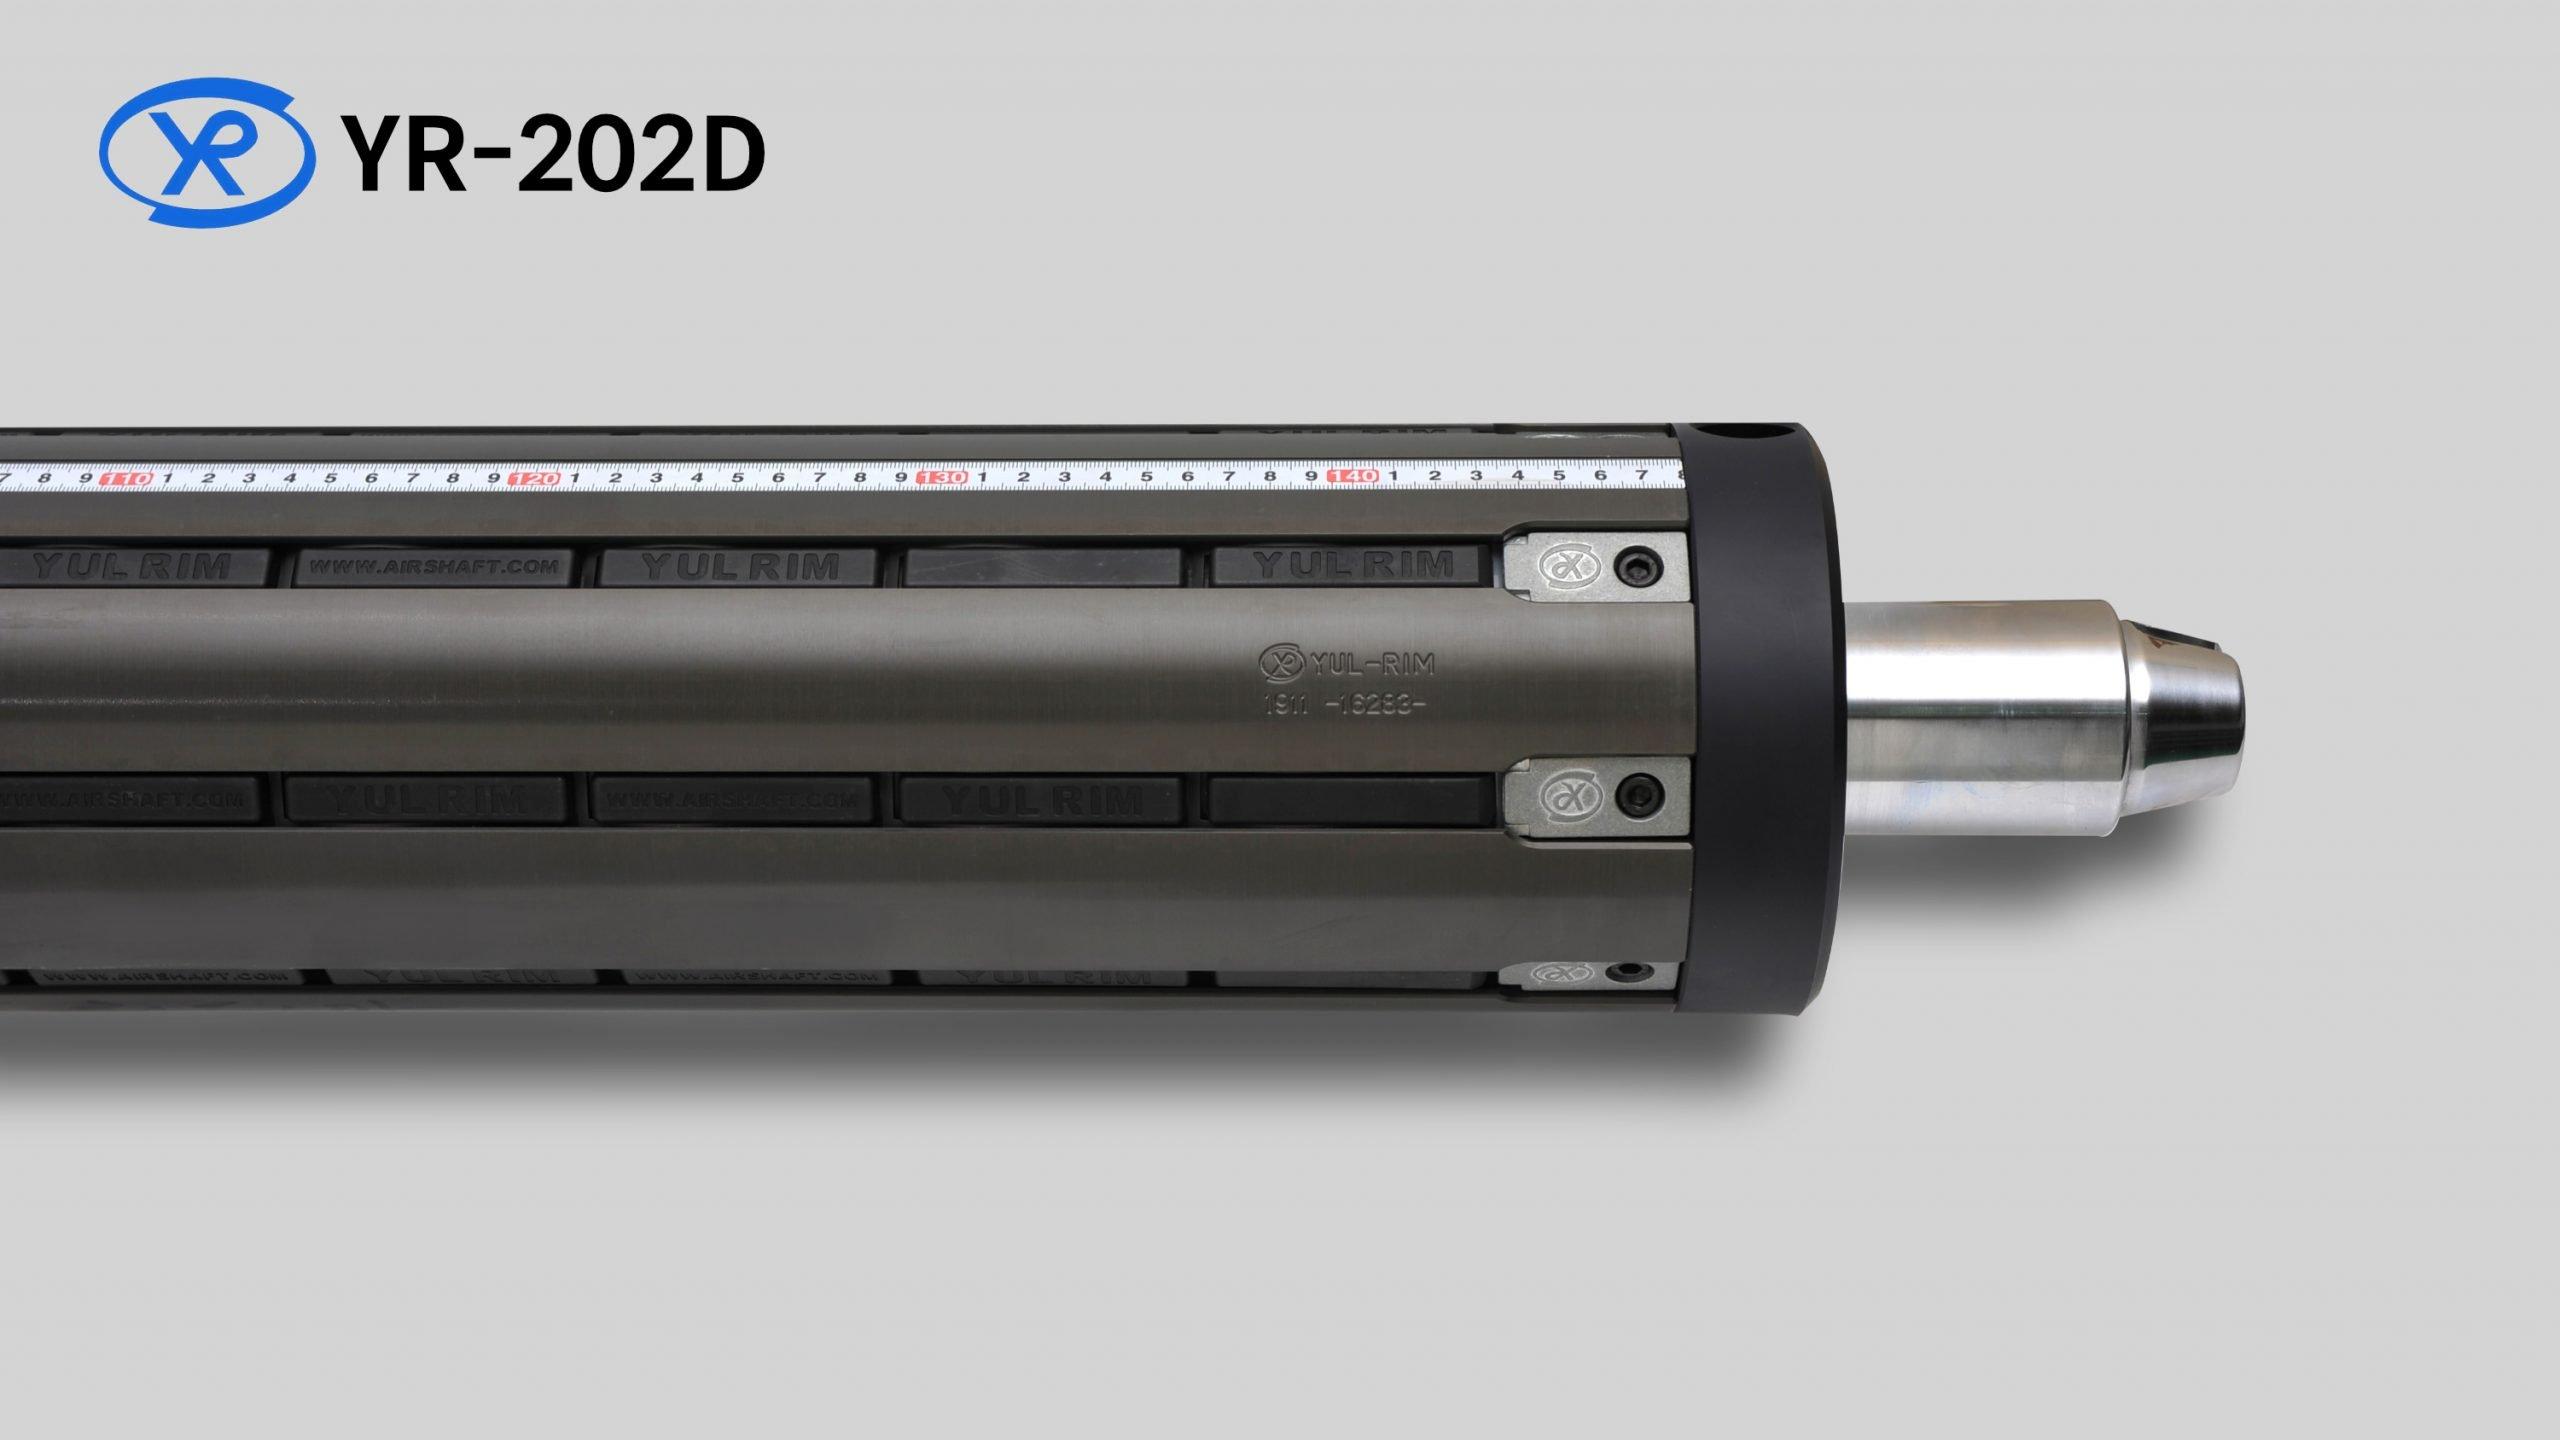 YR-202D